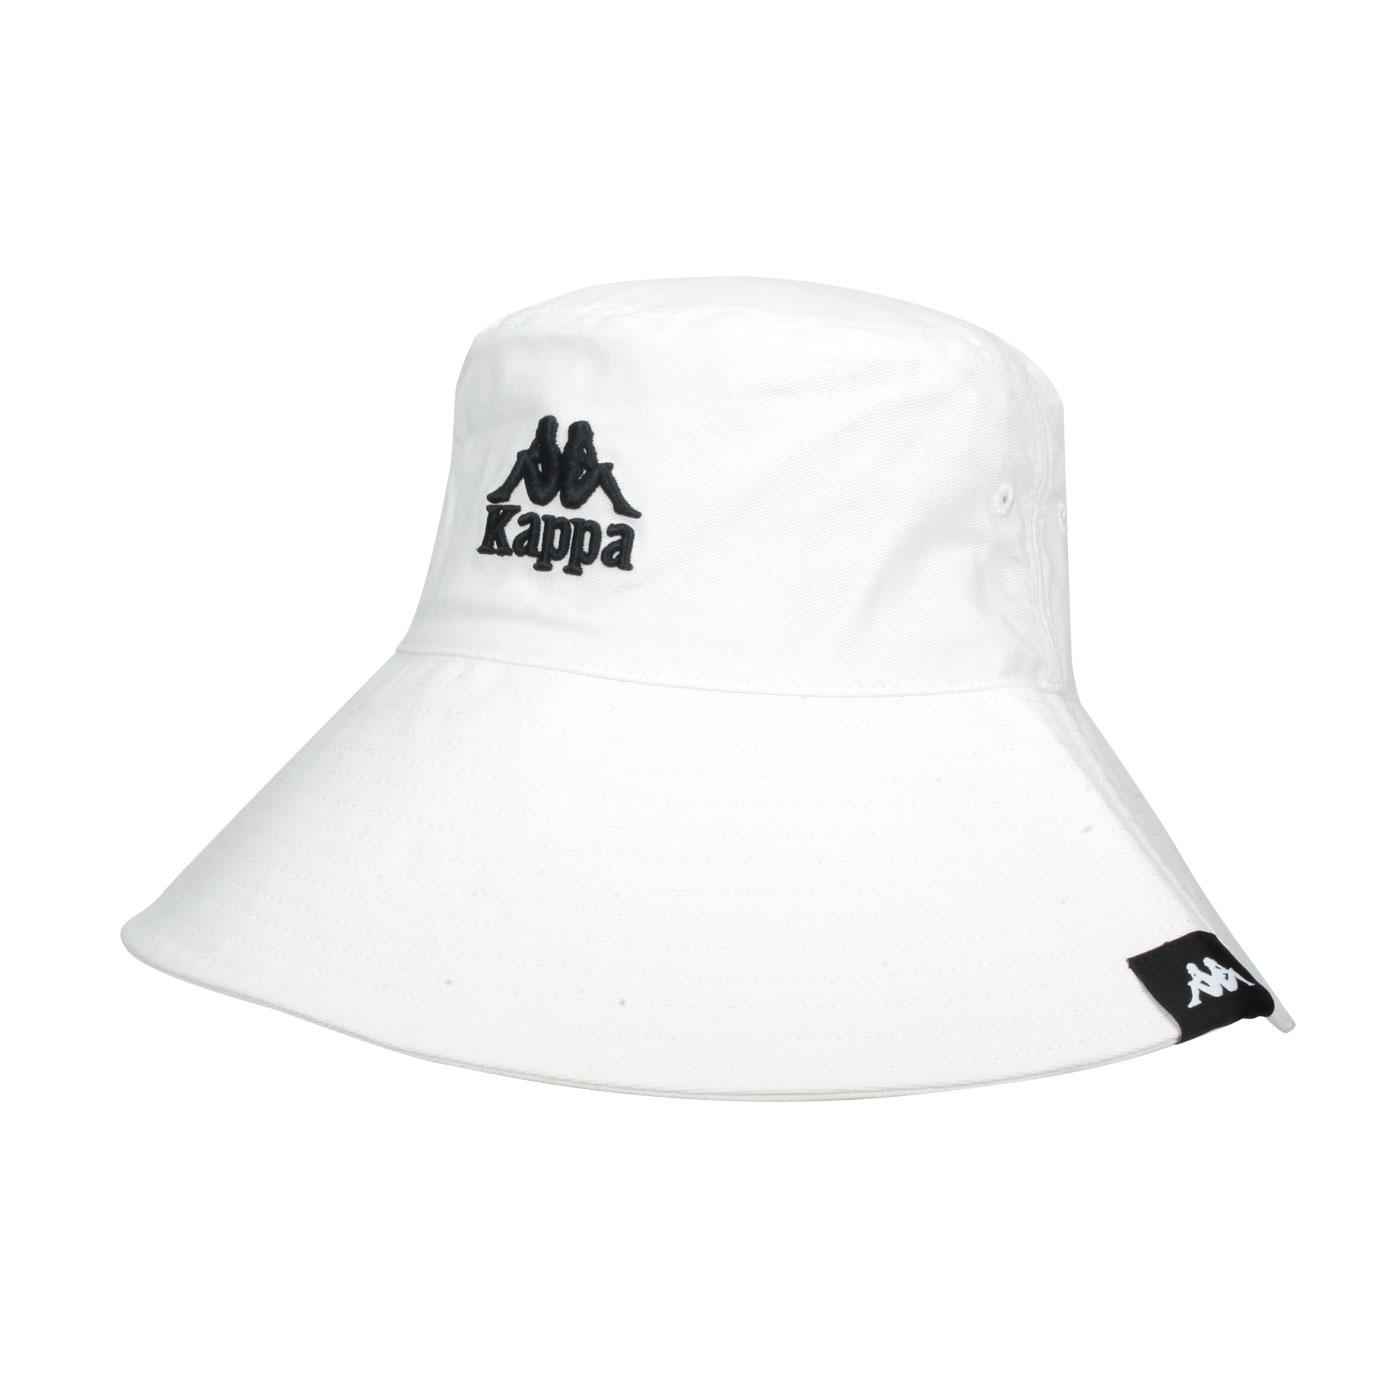 KAPPA 漁夫帽 32186JW-001 - 白黑